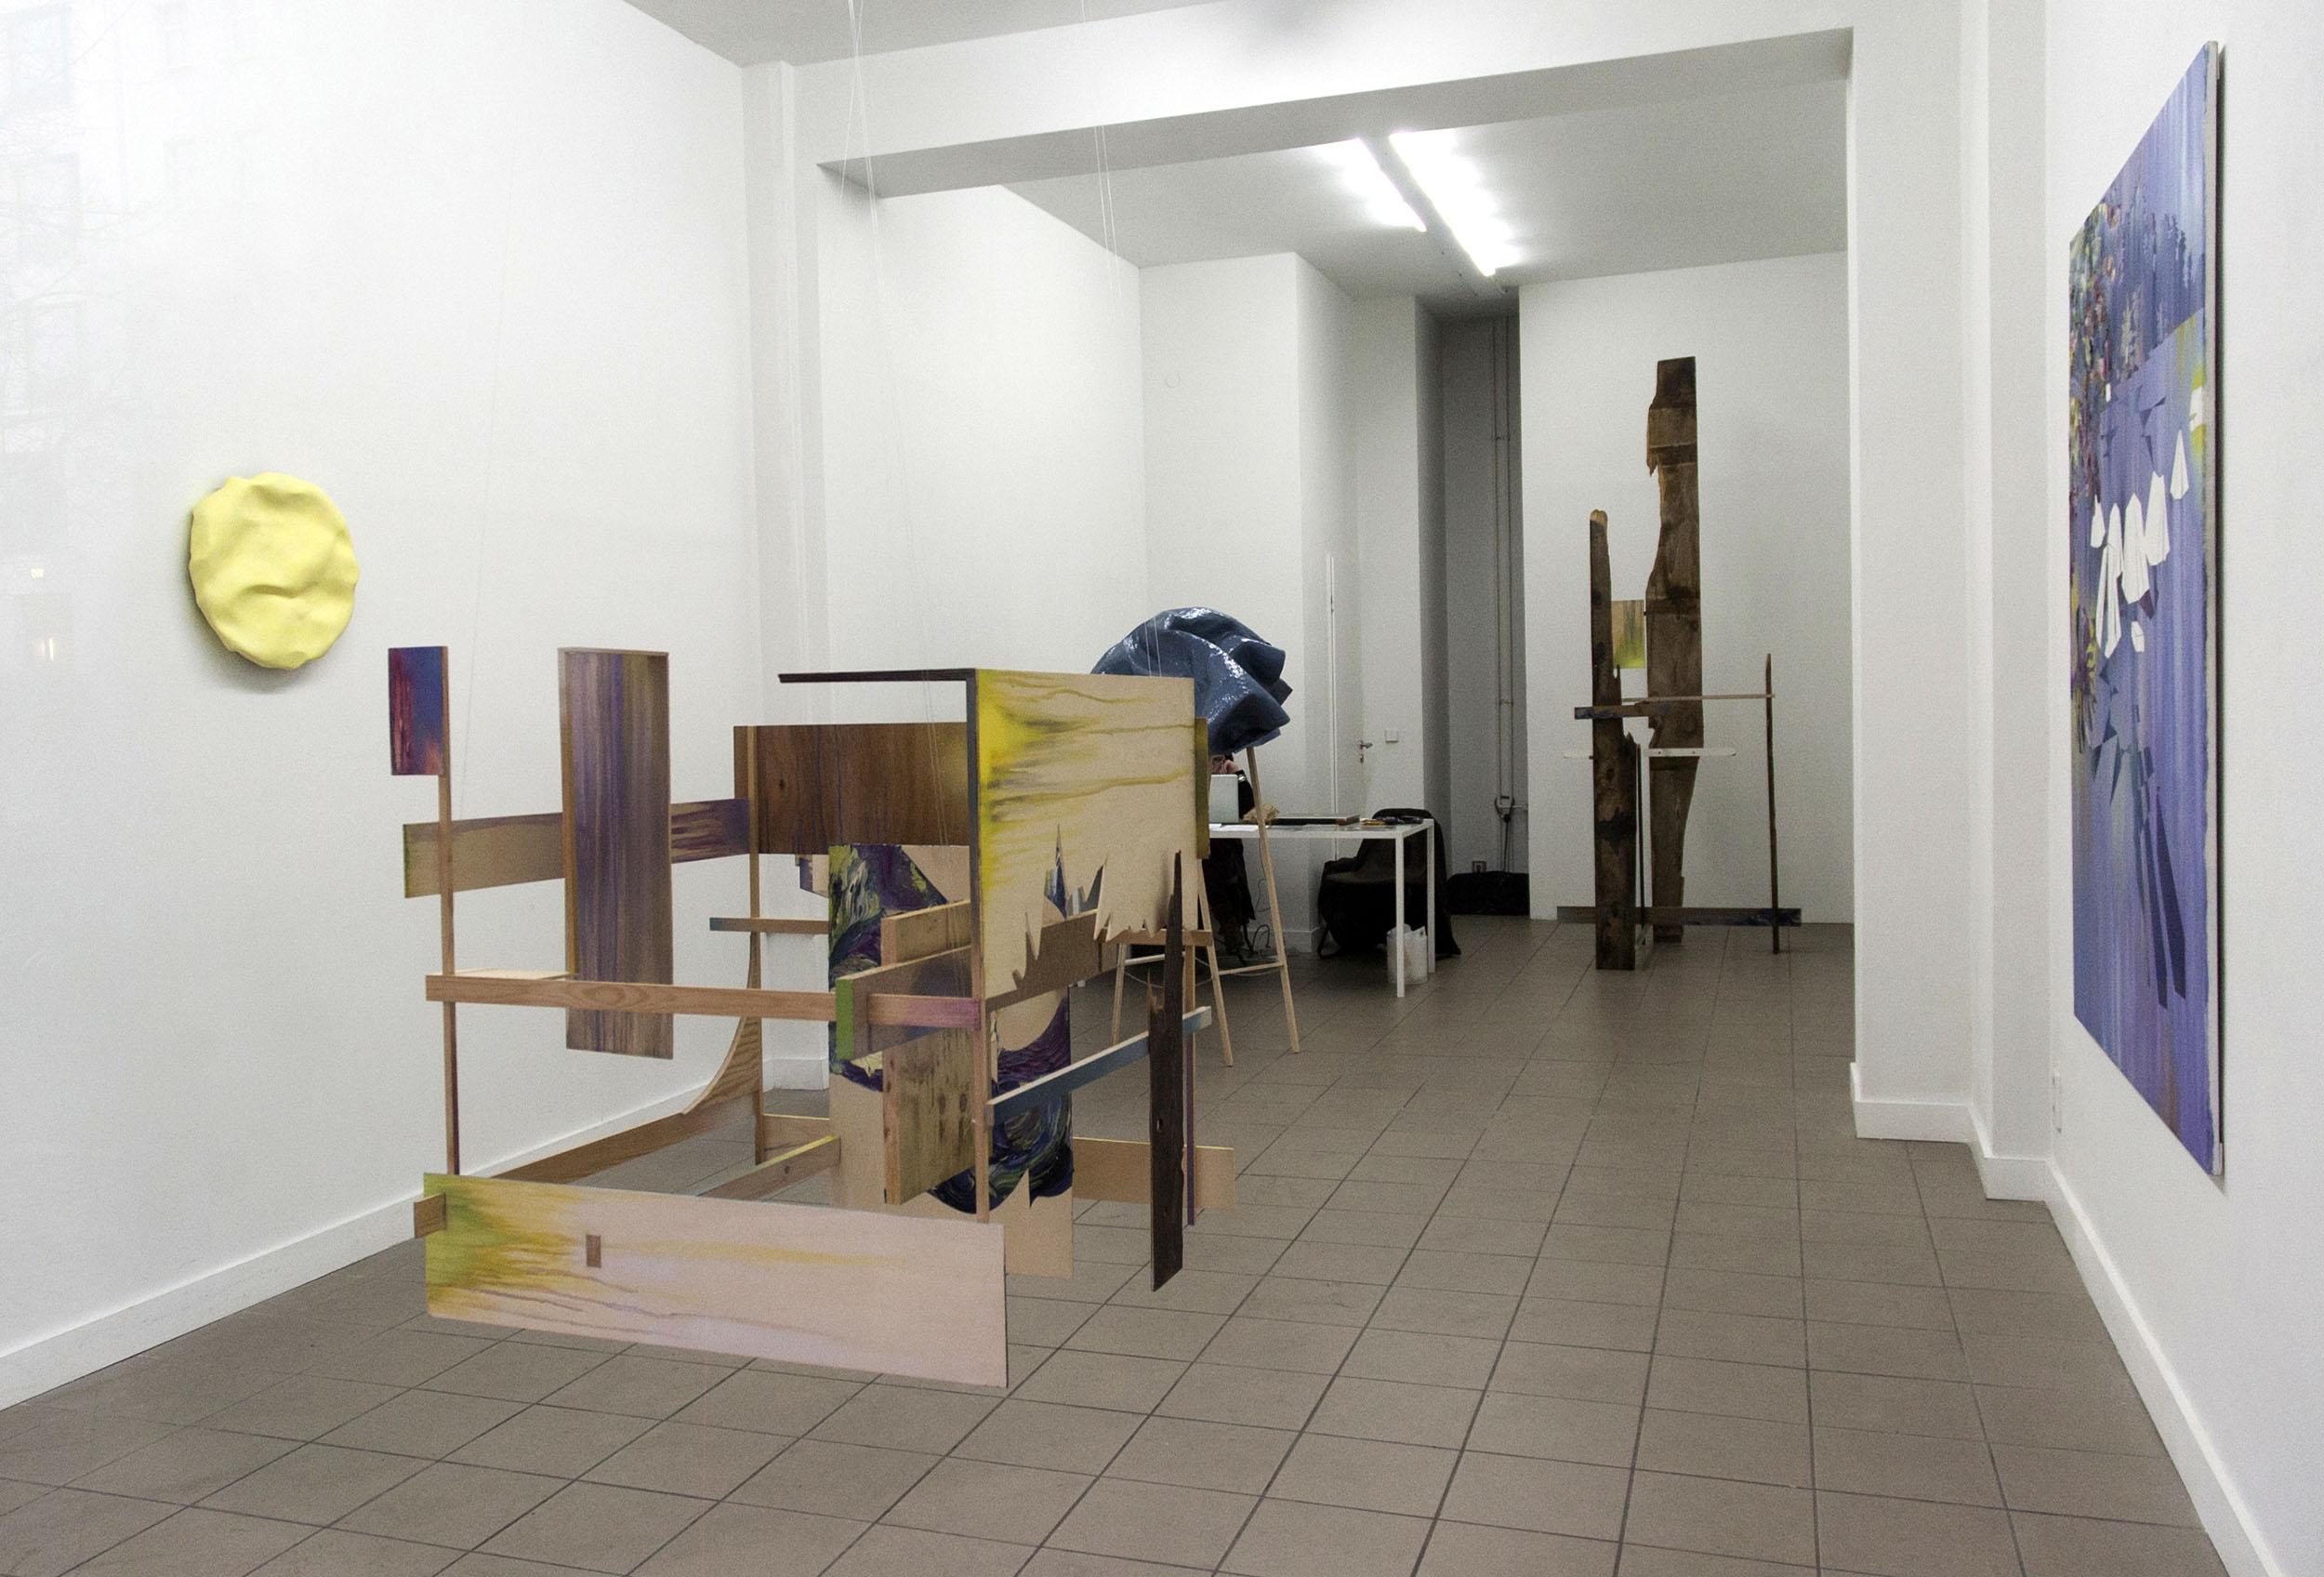 Mübafix 240, Mübafix 48  Matthias Moravek &  Gabriele Künne  exhibition view